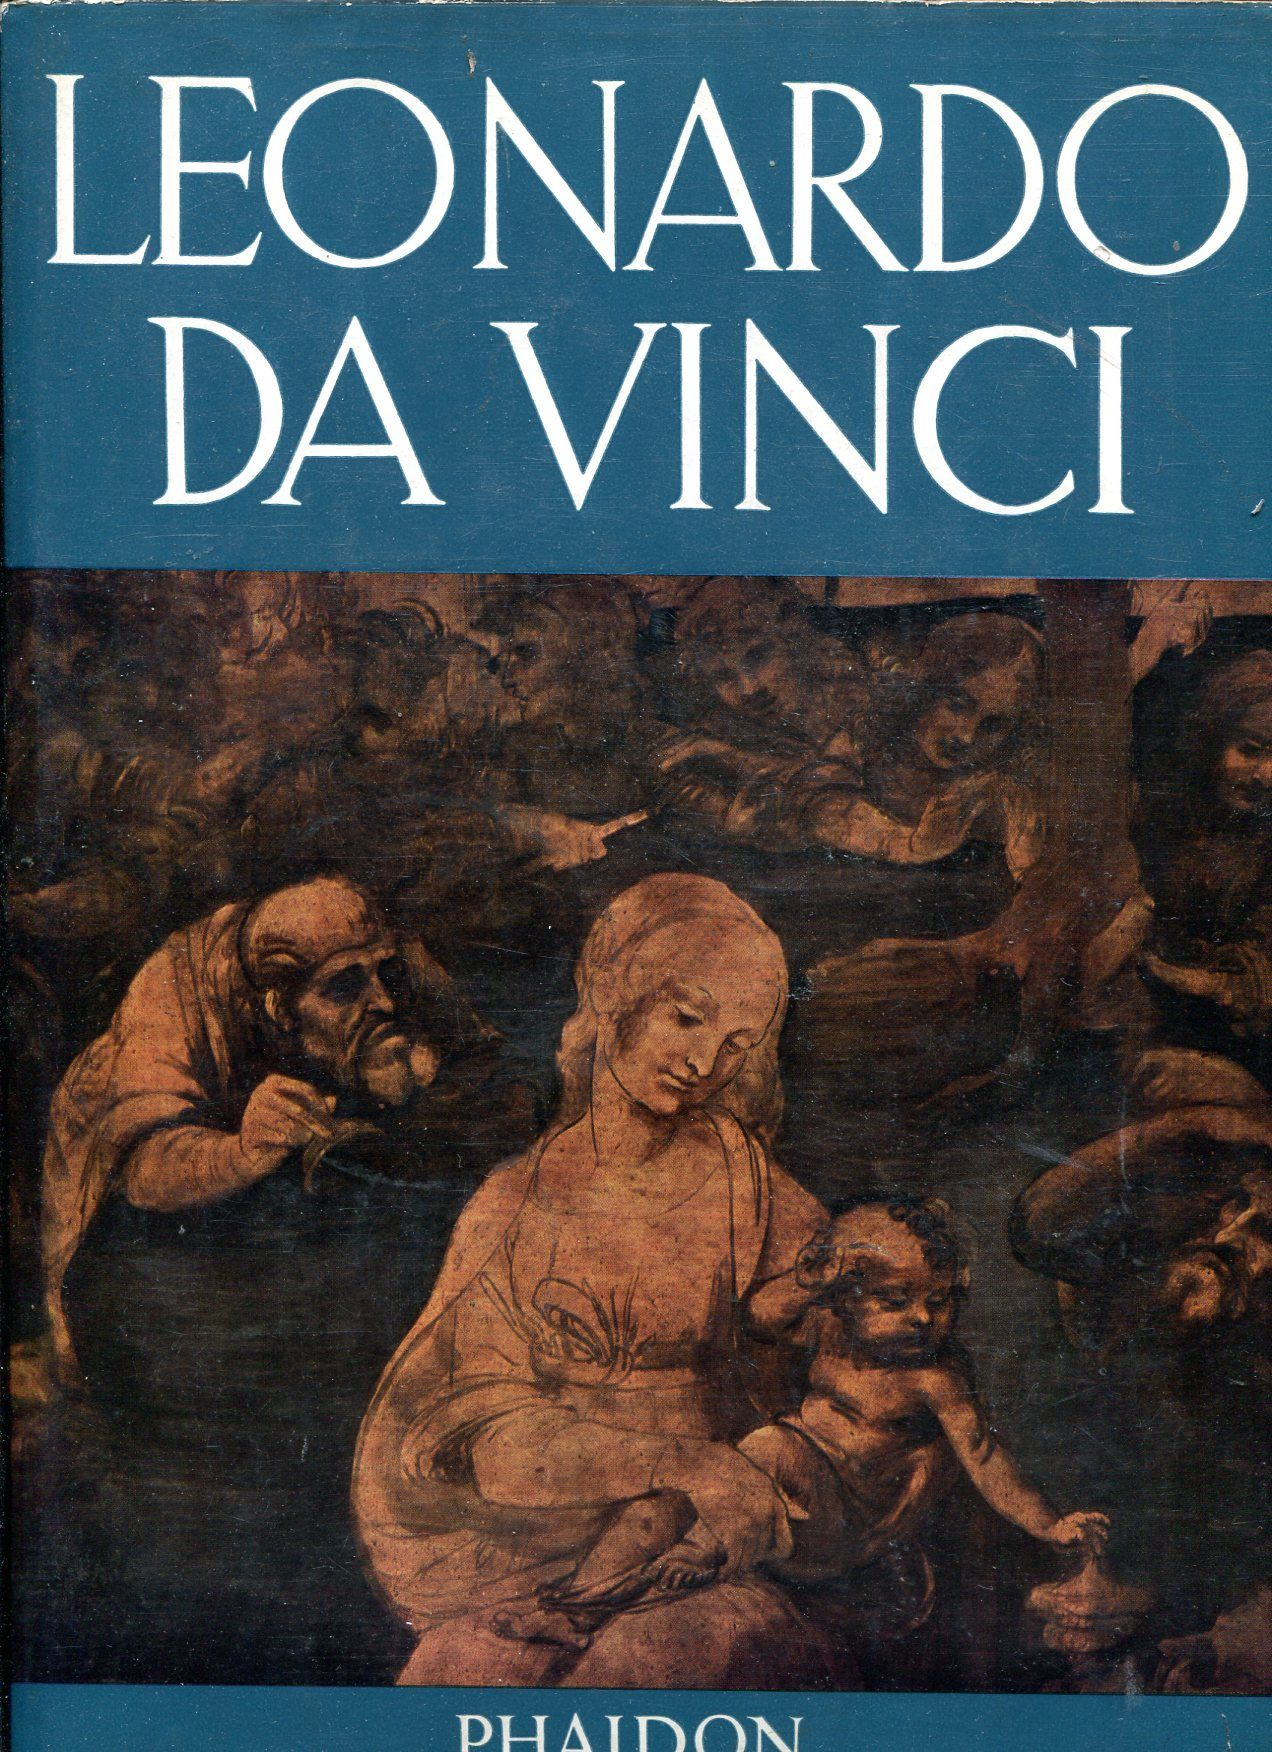 the life and works by leonardo da vinci The illegitimate son of a 25-year-old notary, ser piero, and a peasant girl caterina, leonardo da vinci was born on april 15, 1452, in vinci, italy.